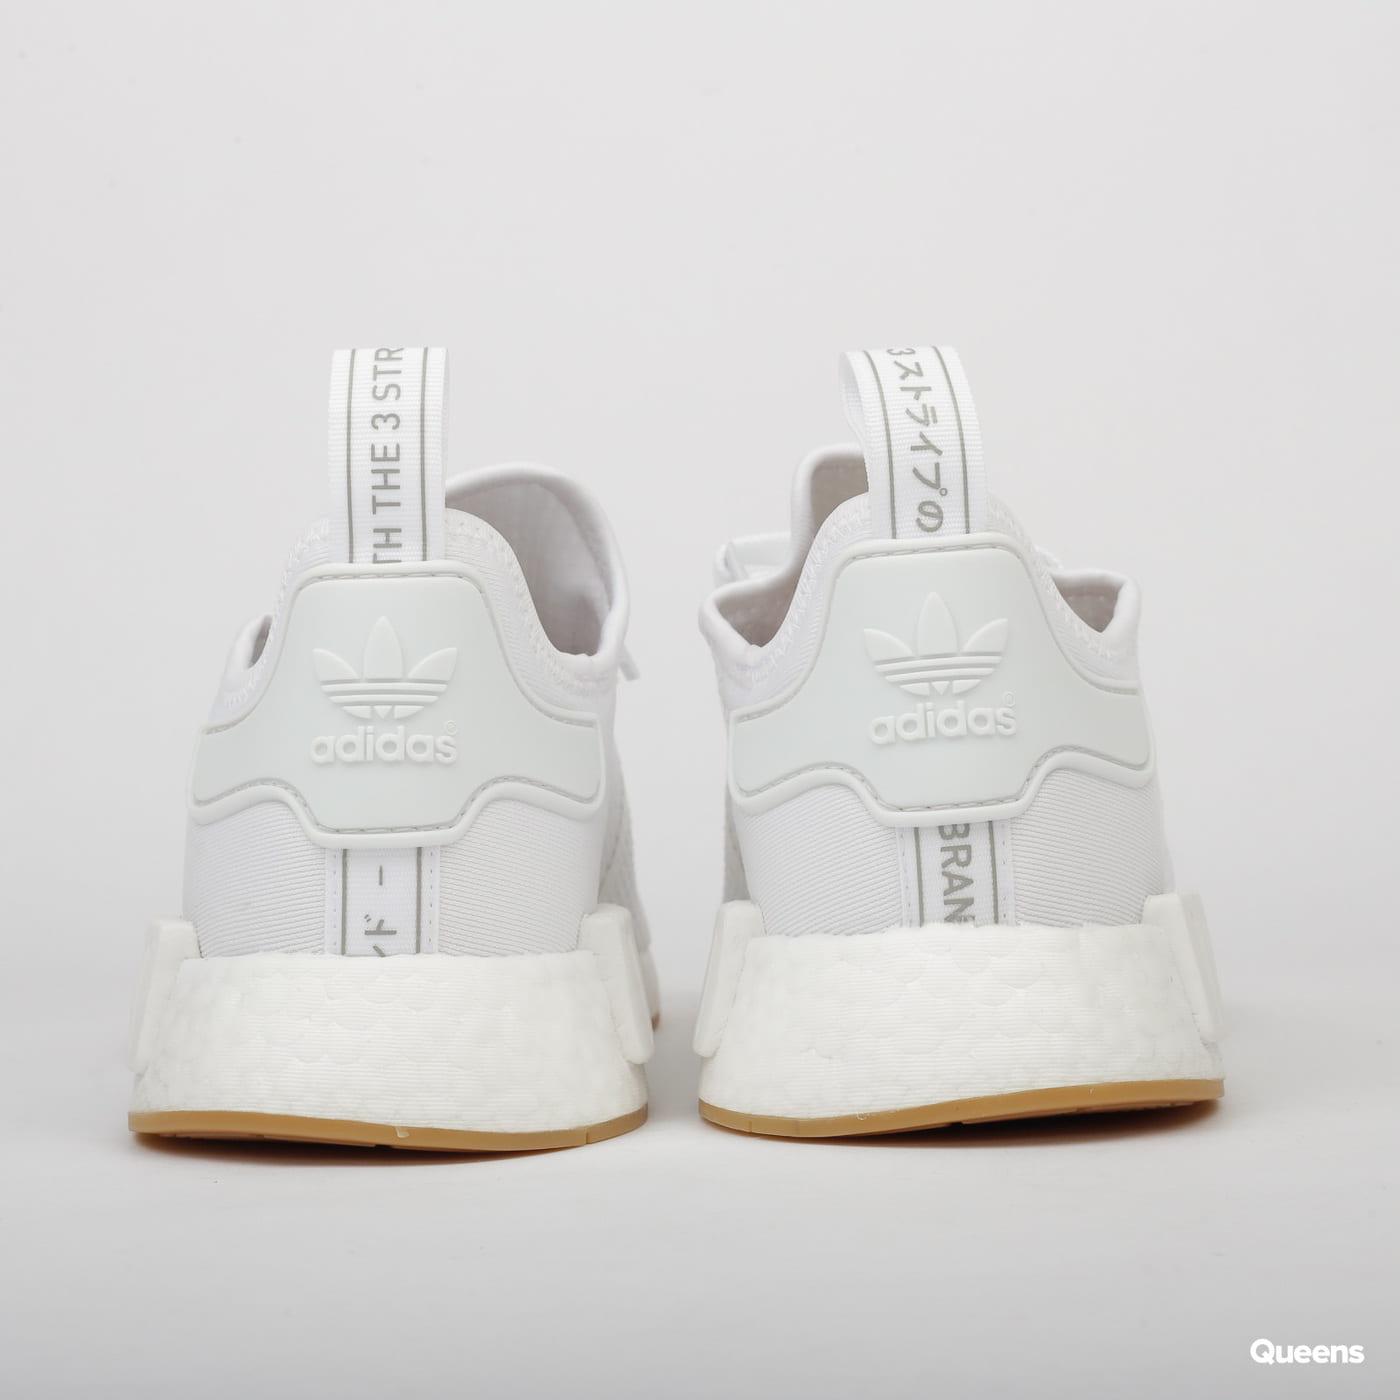 adidas Originals NMD_R1 cloud white / cloud white / crystal white